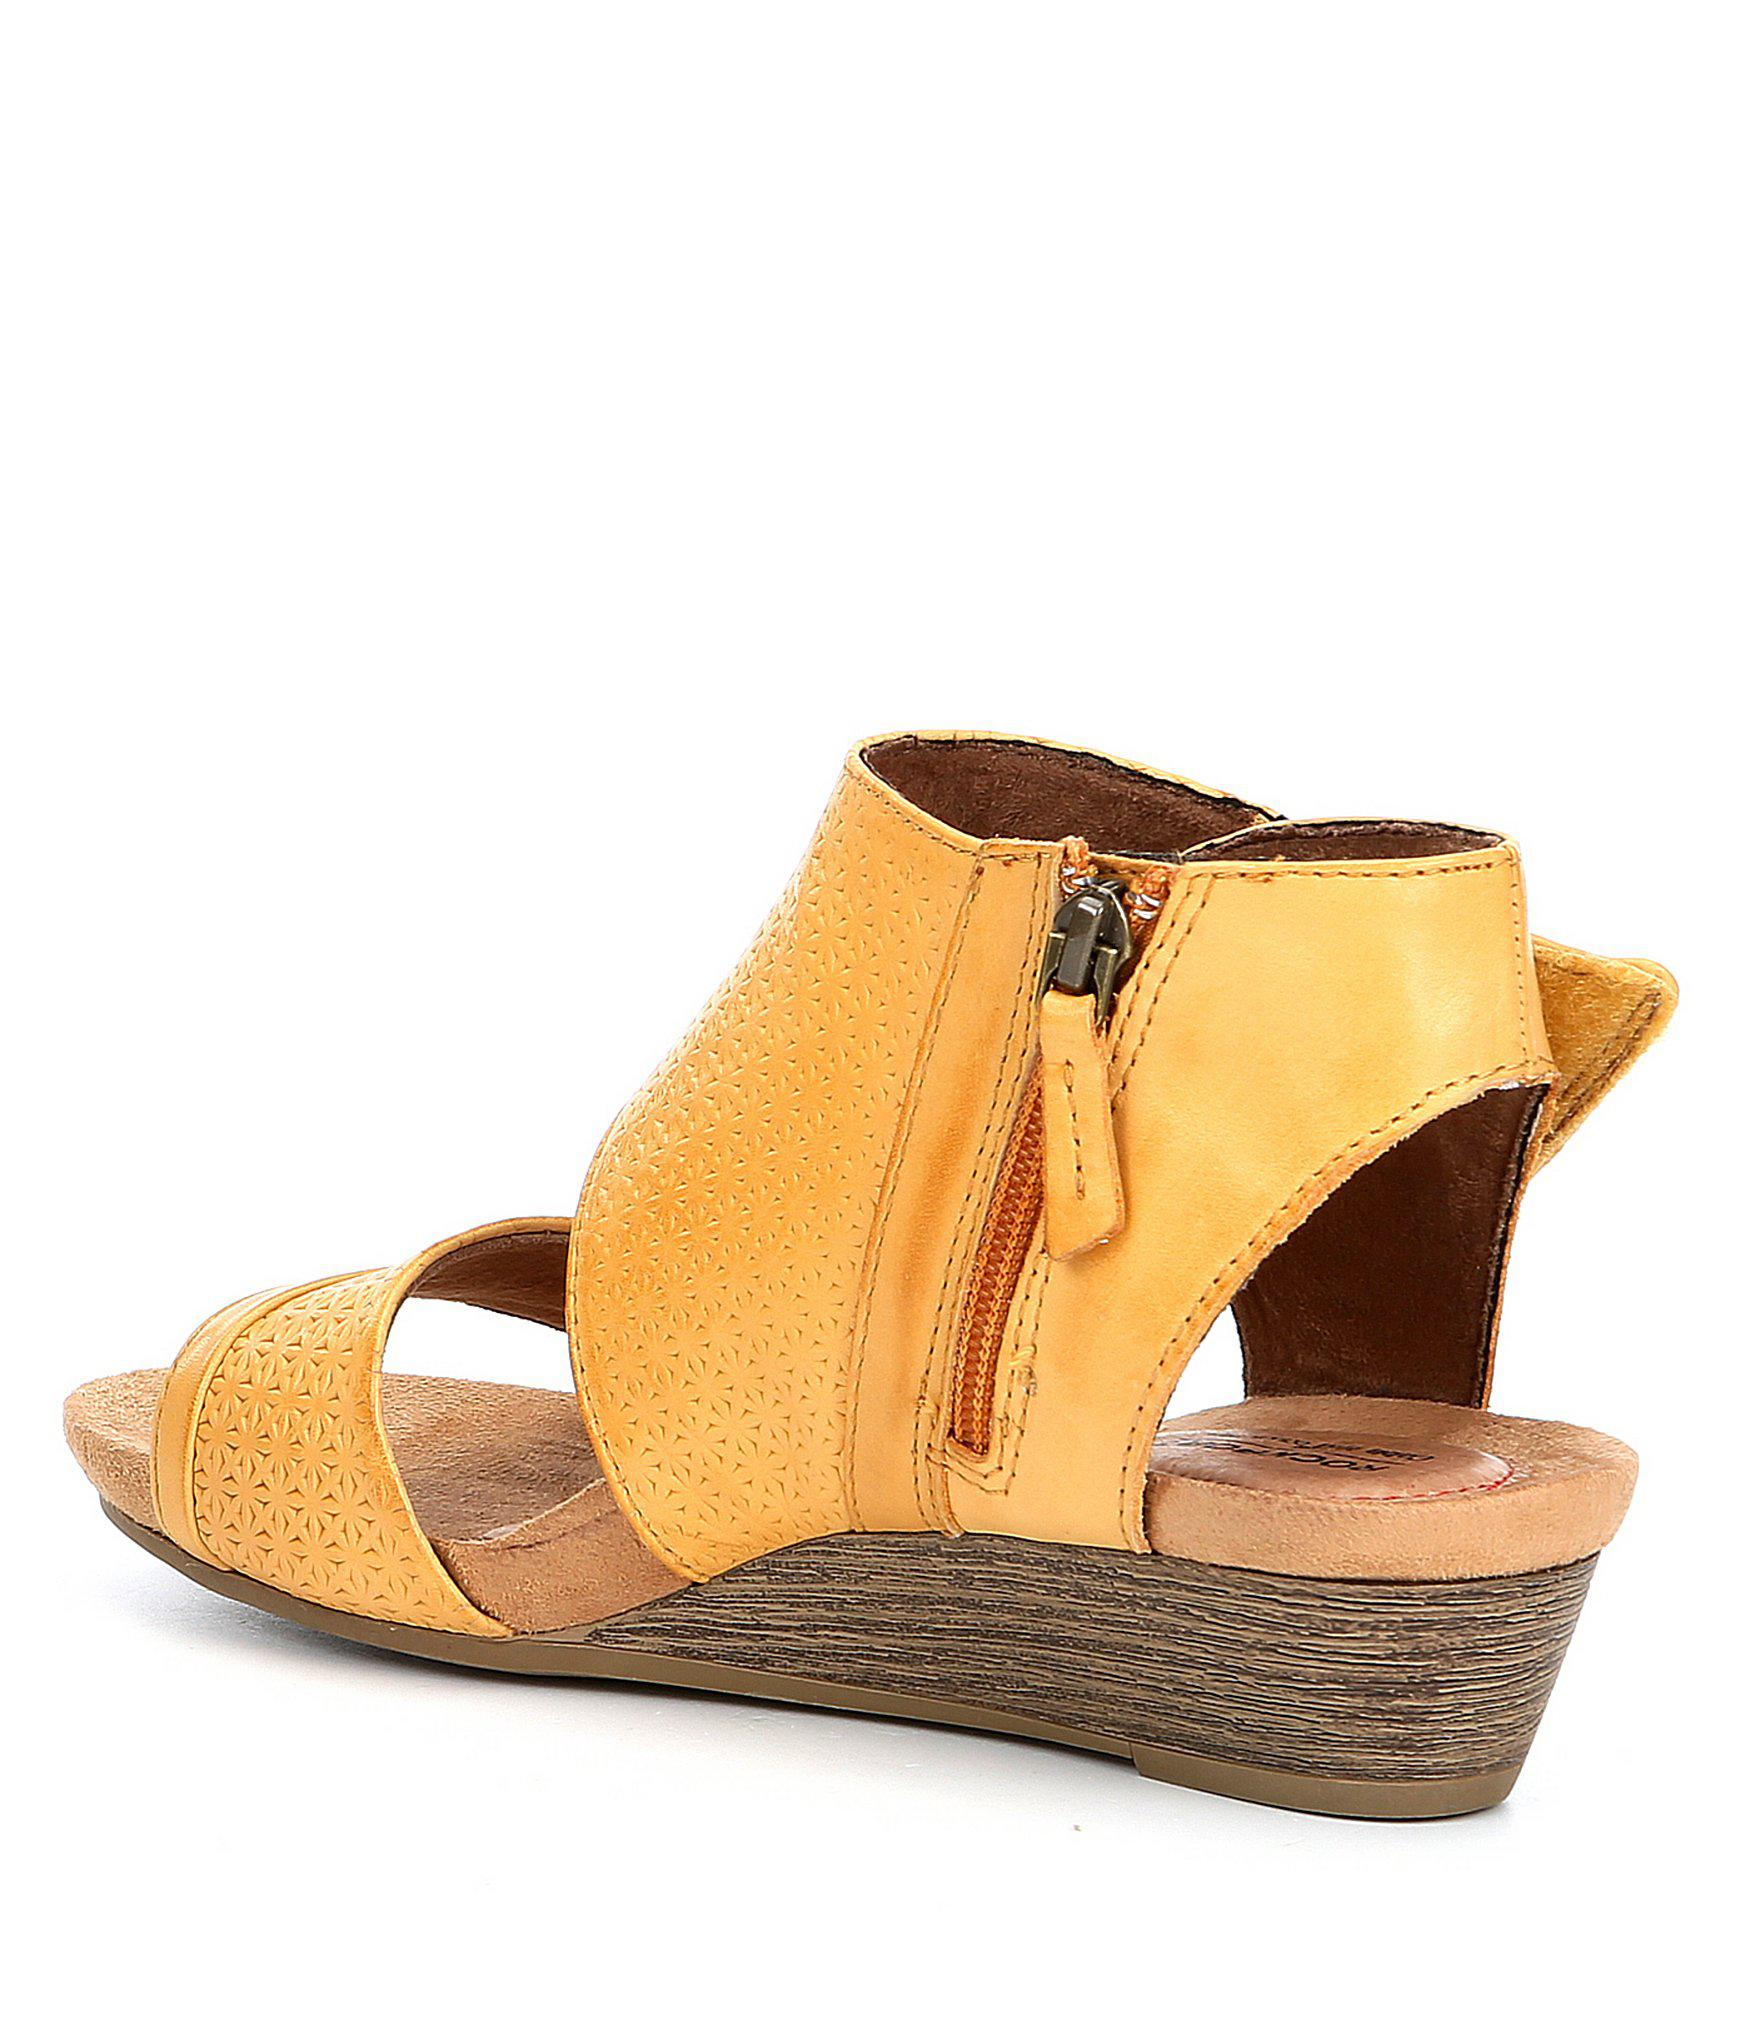 2873171cdb92 Rockport - Multicolor Cobb Hill Hollywood Cuff Wedge Sandals - Lyst. View  fullscreen